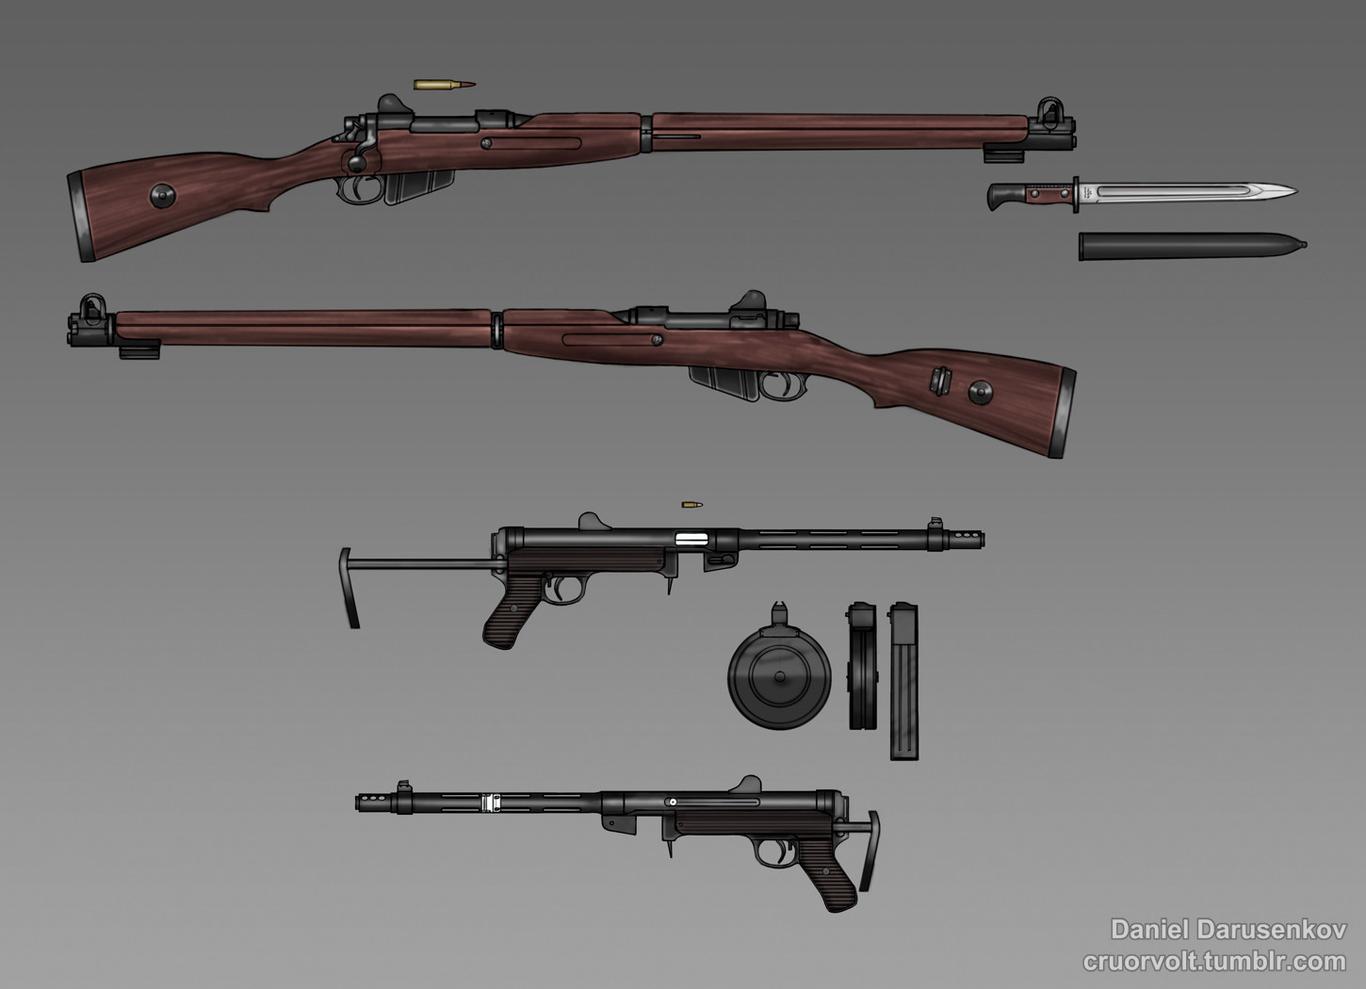 Some guns.